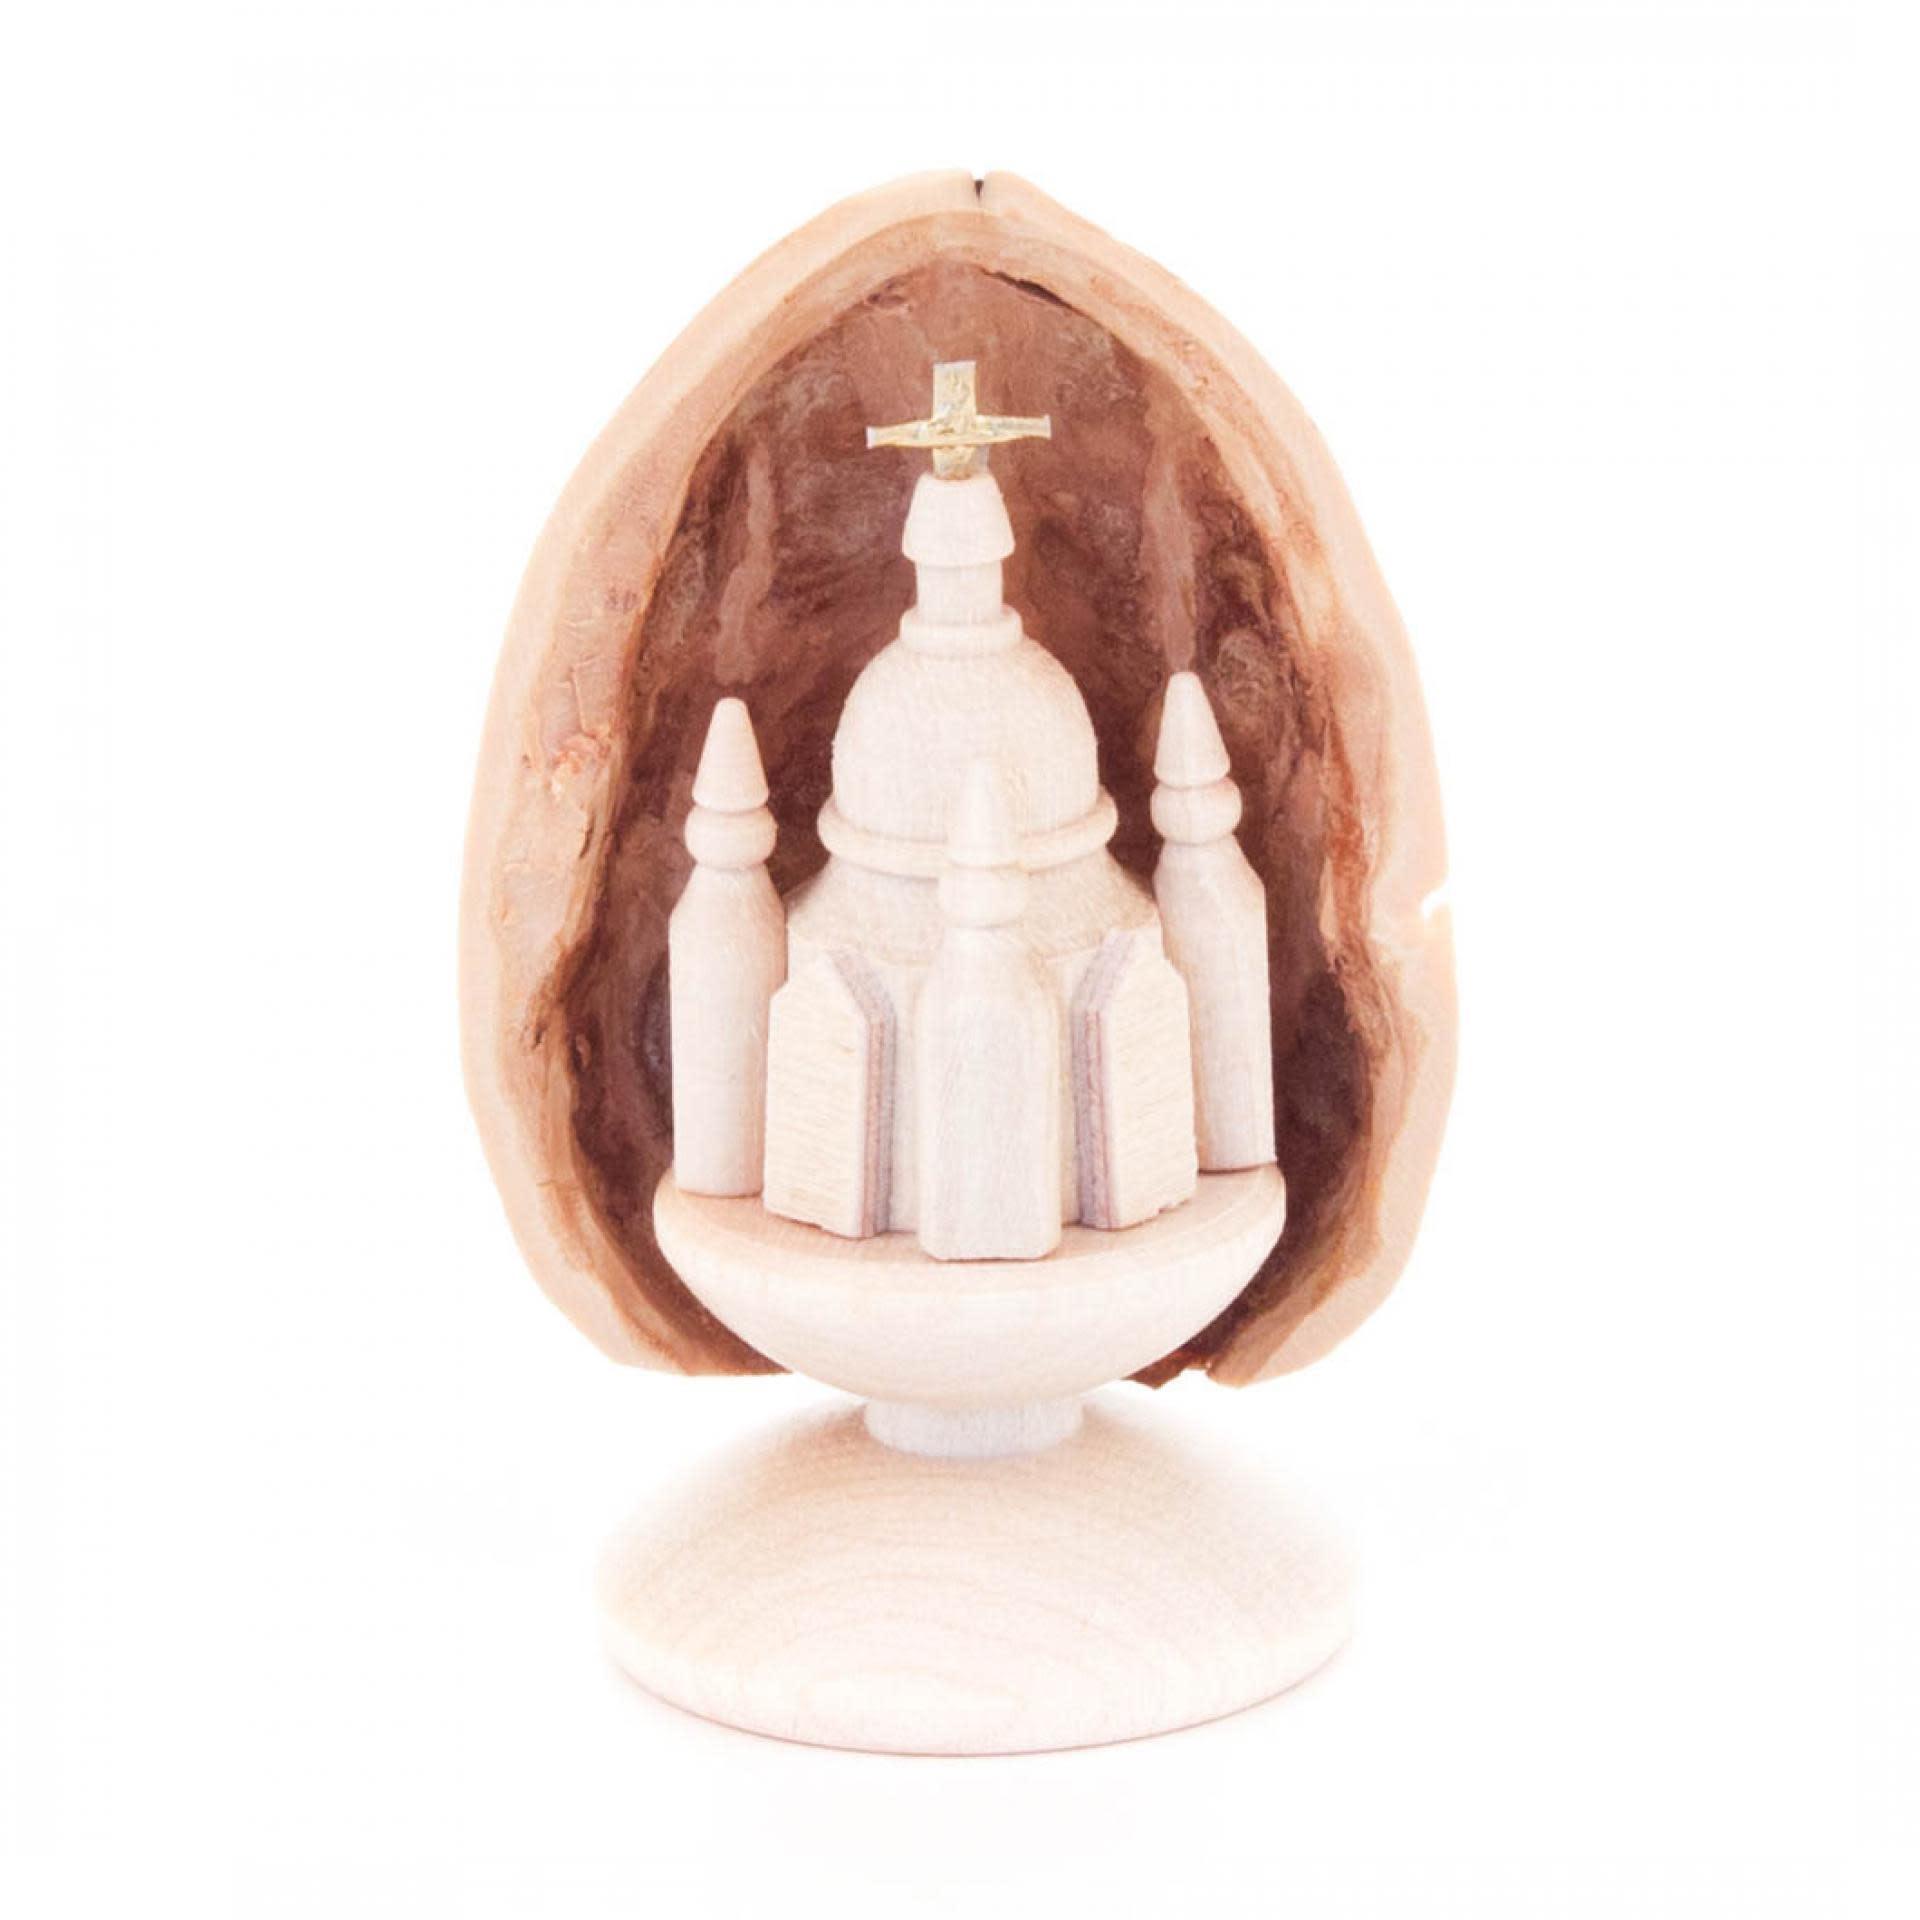 199/351S    Walnut shell with Frauenkirche